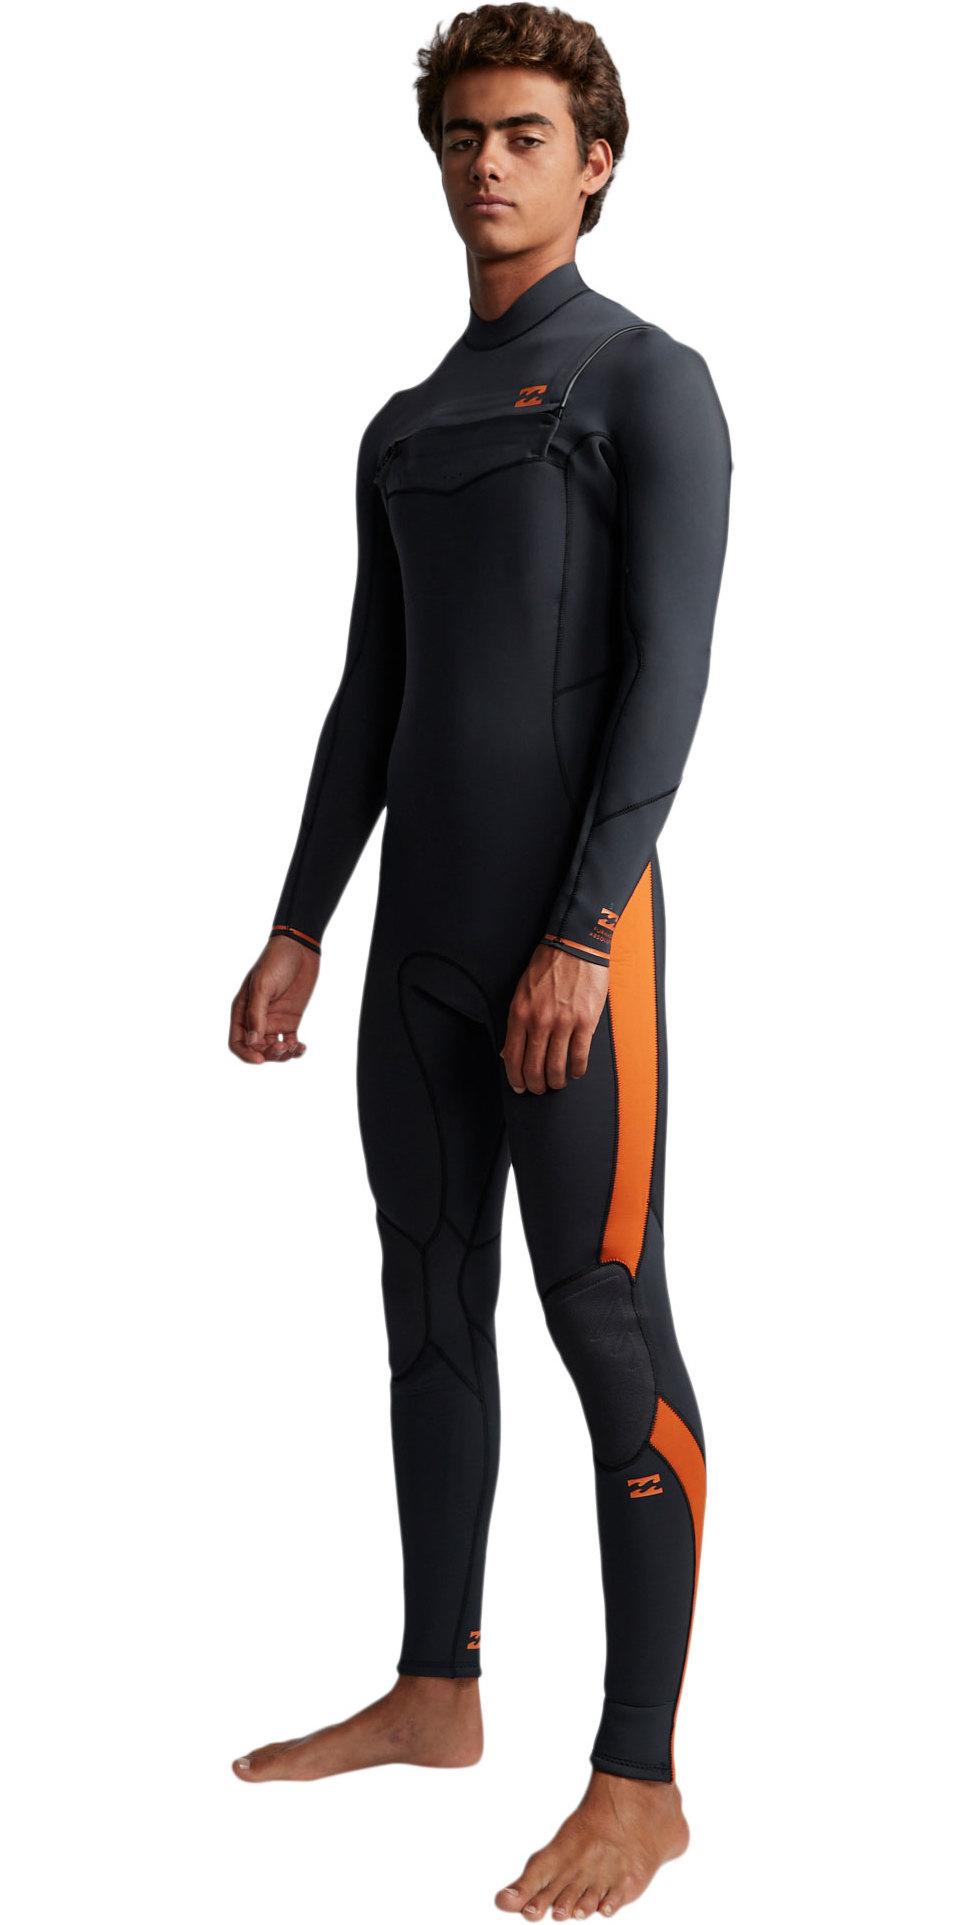 2019 Billabong Mens Furnace Absolute 5/4mm Chest Zip Wetsuit Black Sand Q45M09